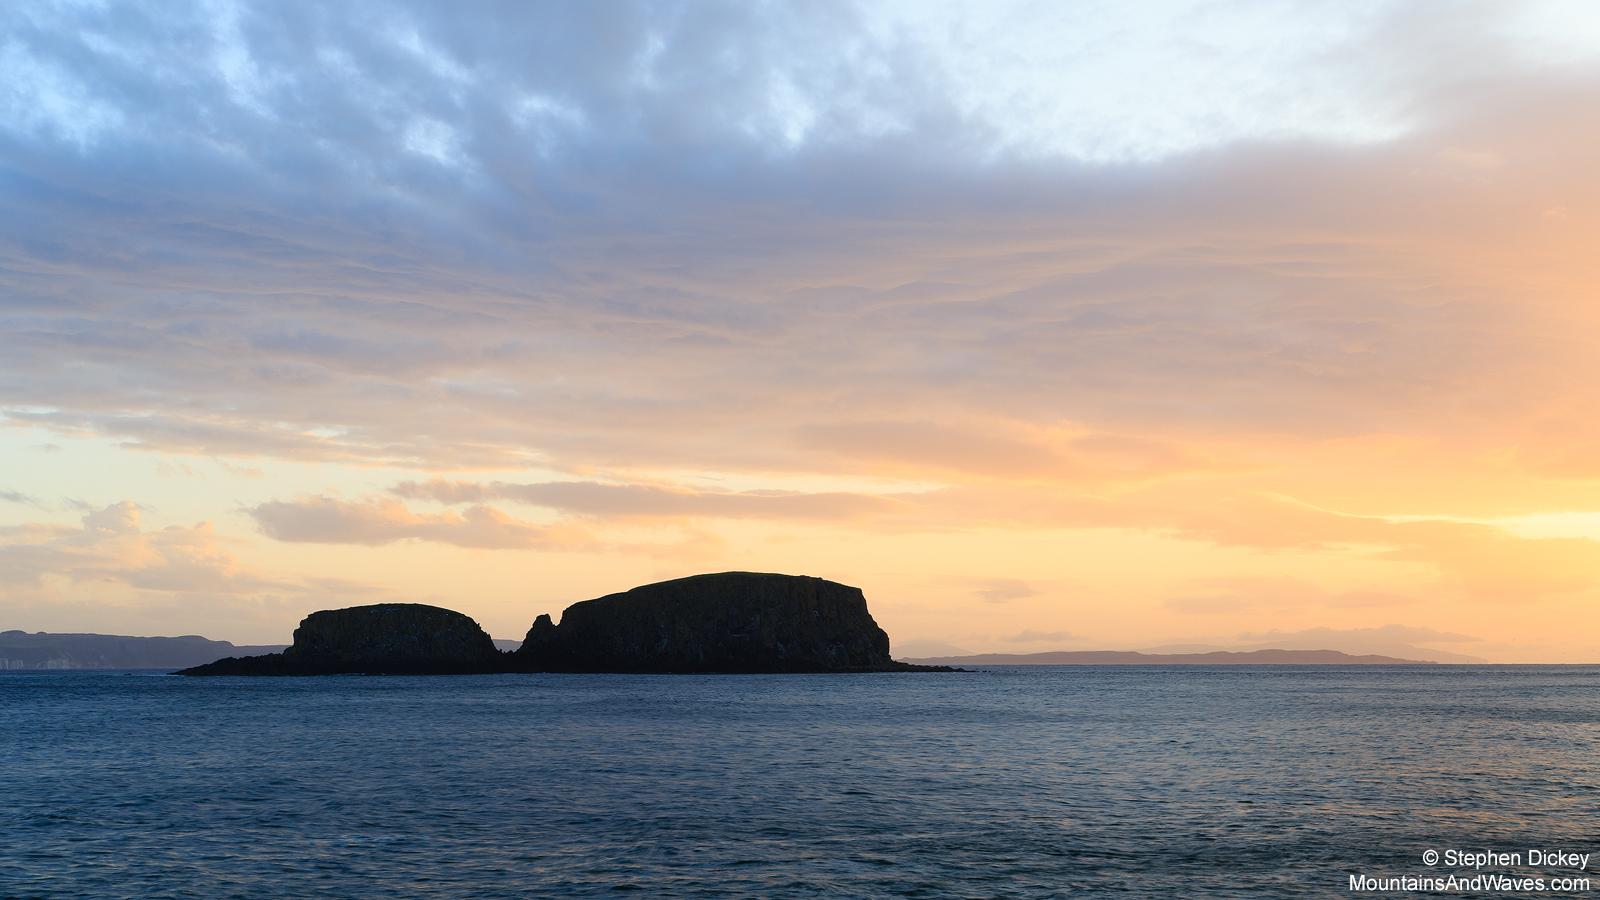 Ballintoy-Soft-Sunrise-Northern-Ireland-Landscape-Photography.jpg